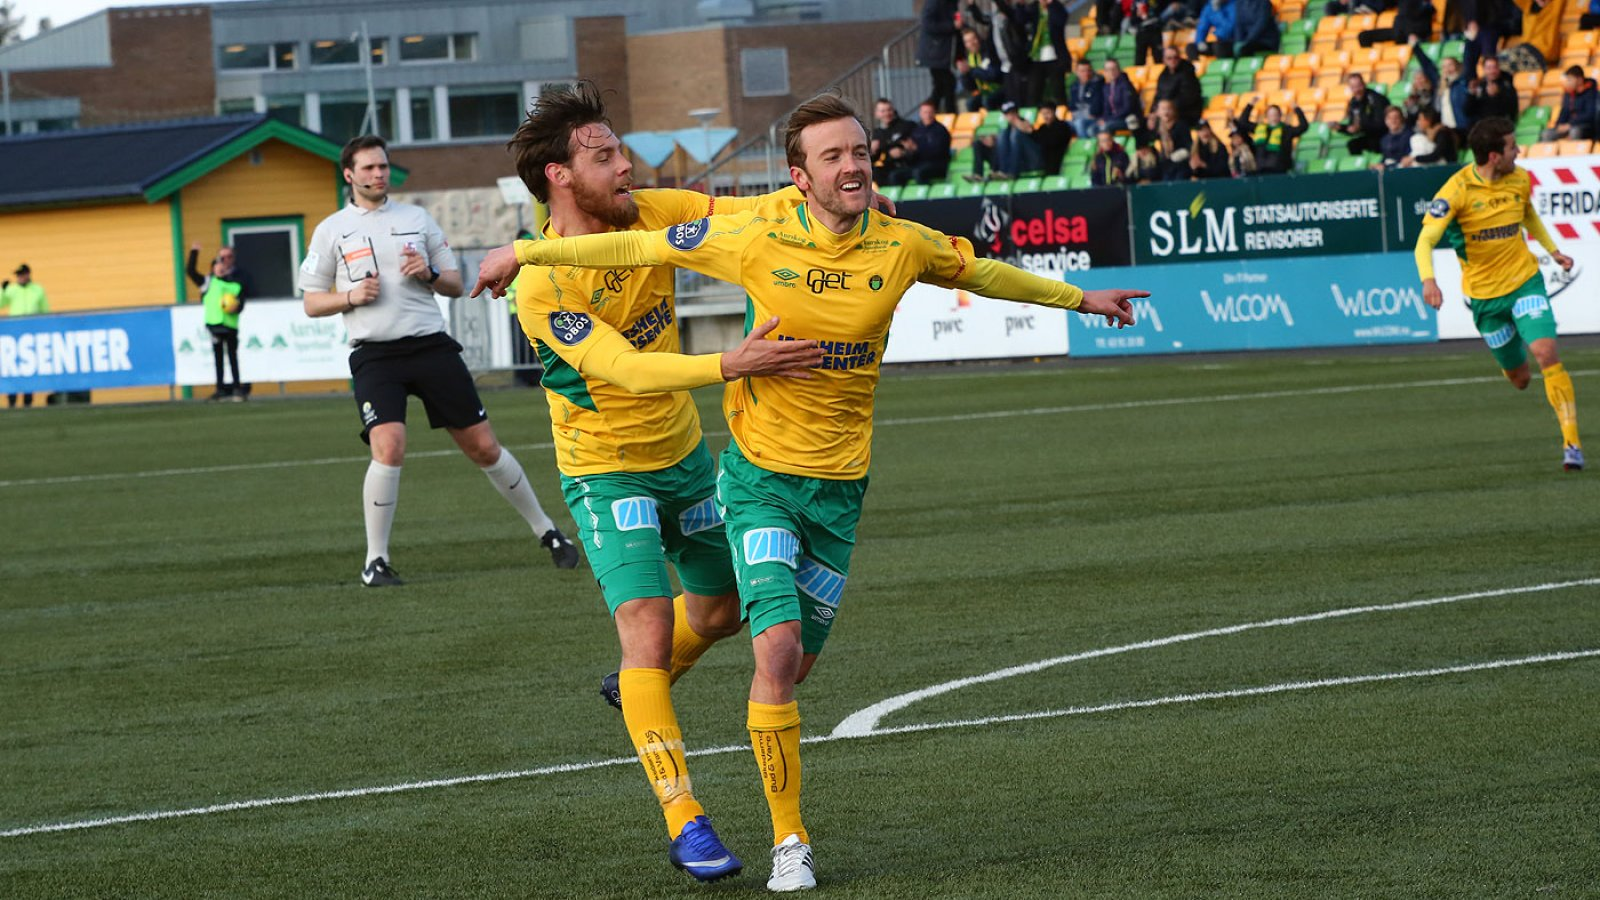 Ole Kristian Langås og Christian Aas